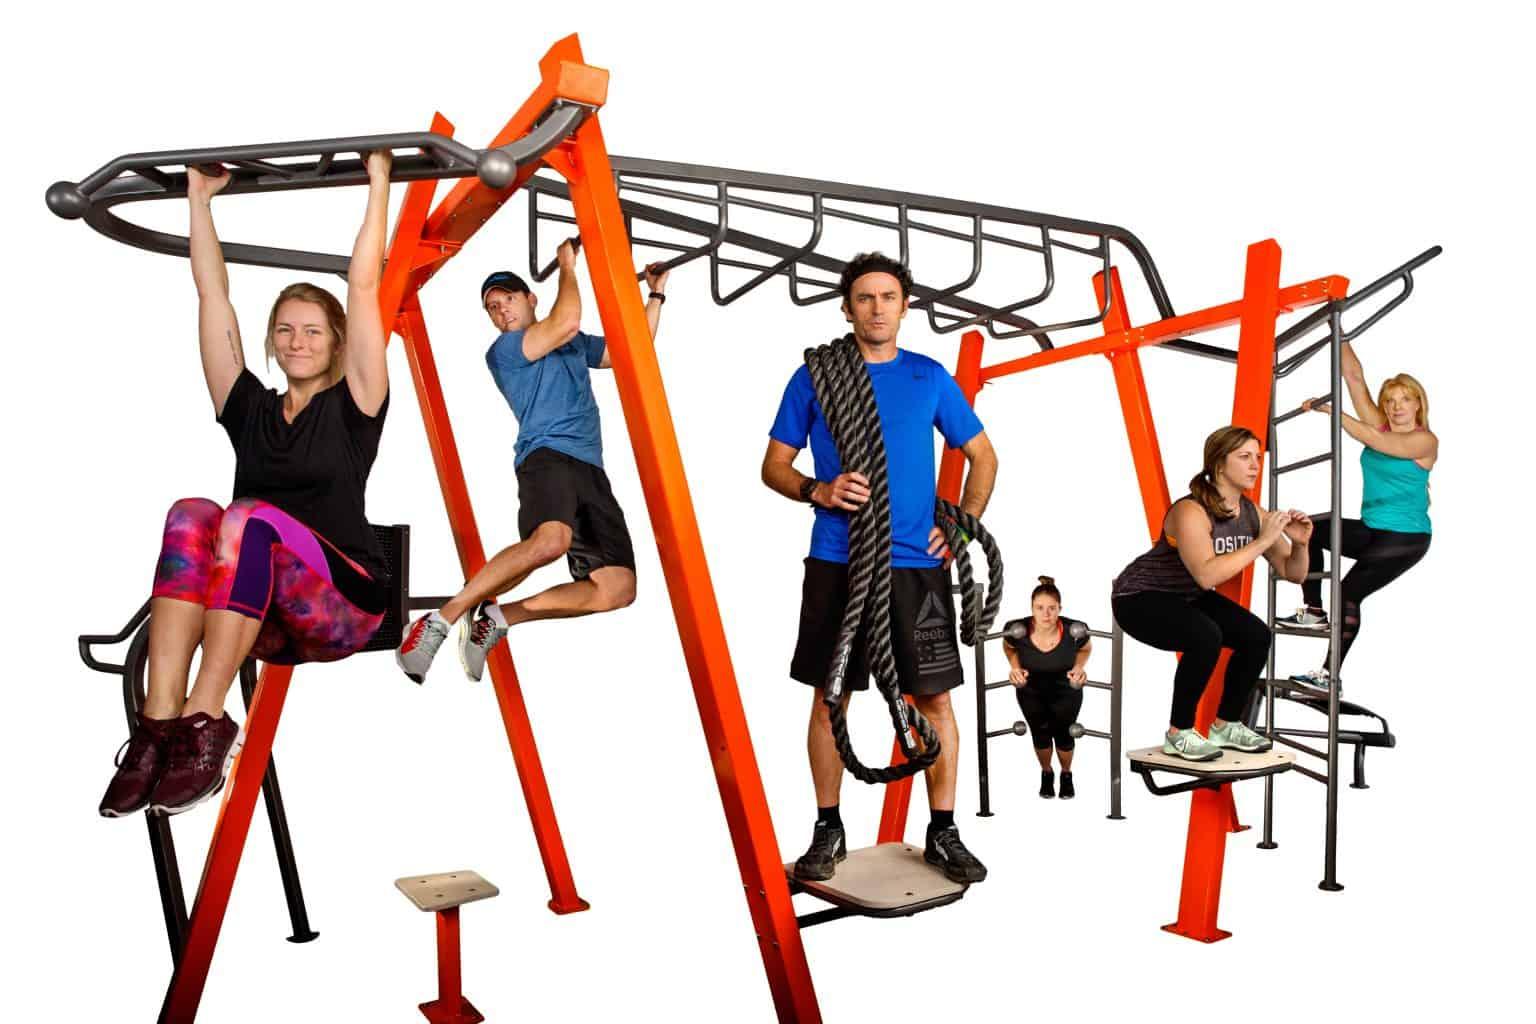 outdoor-fitness-equipment_49643265183_o-1536x1024